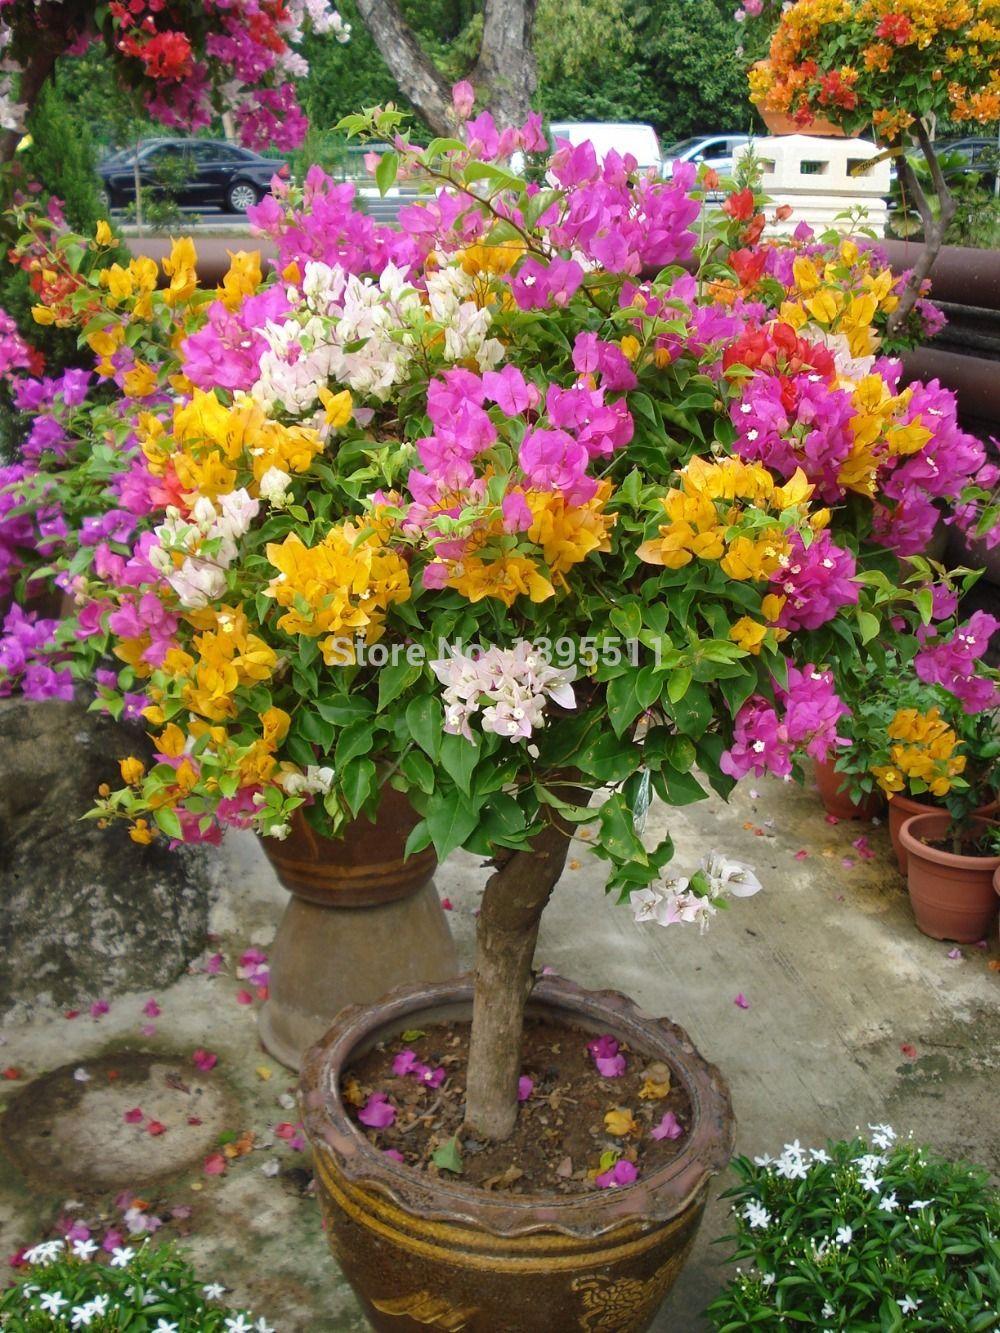 100% Original High Quality 20pcs Mix color Bougainvillea spectabilis ...